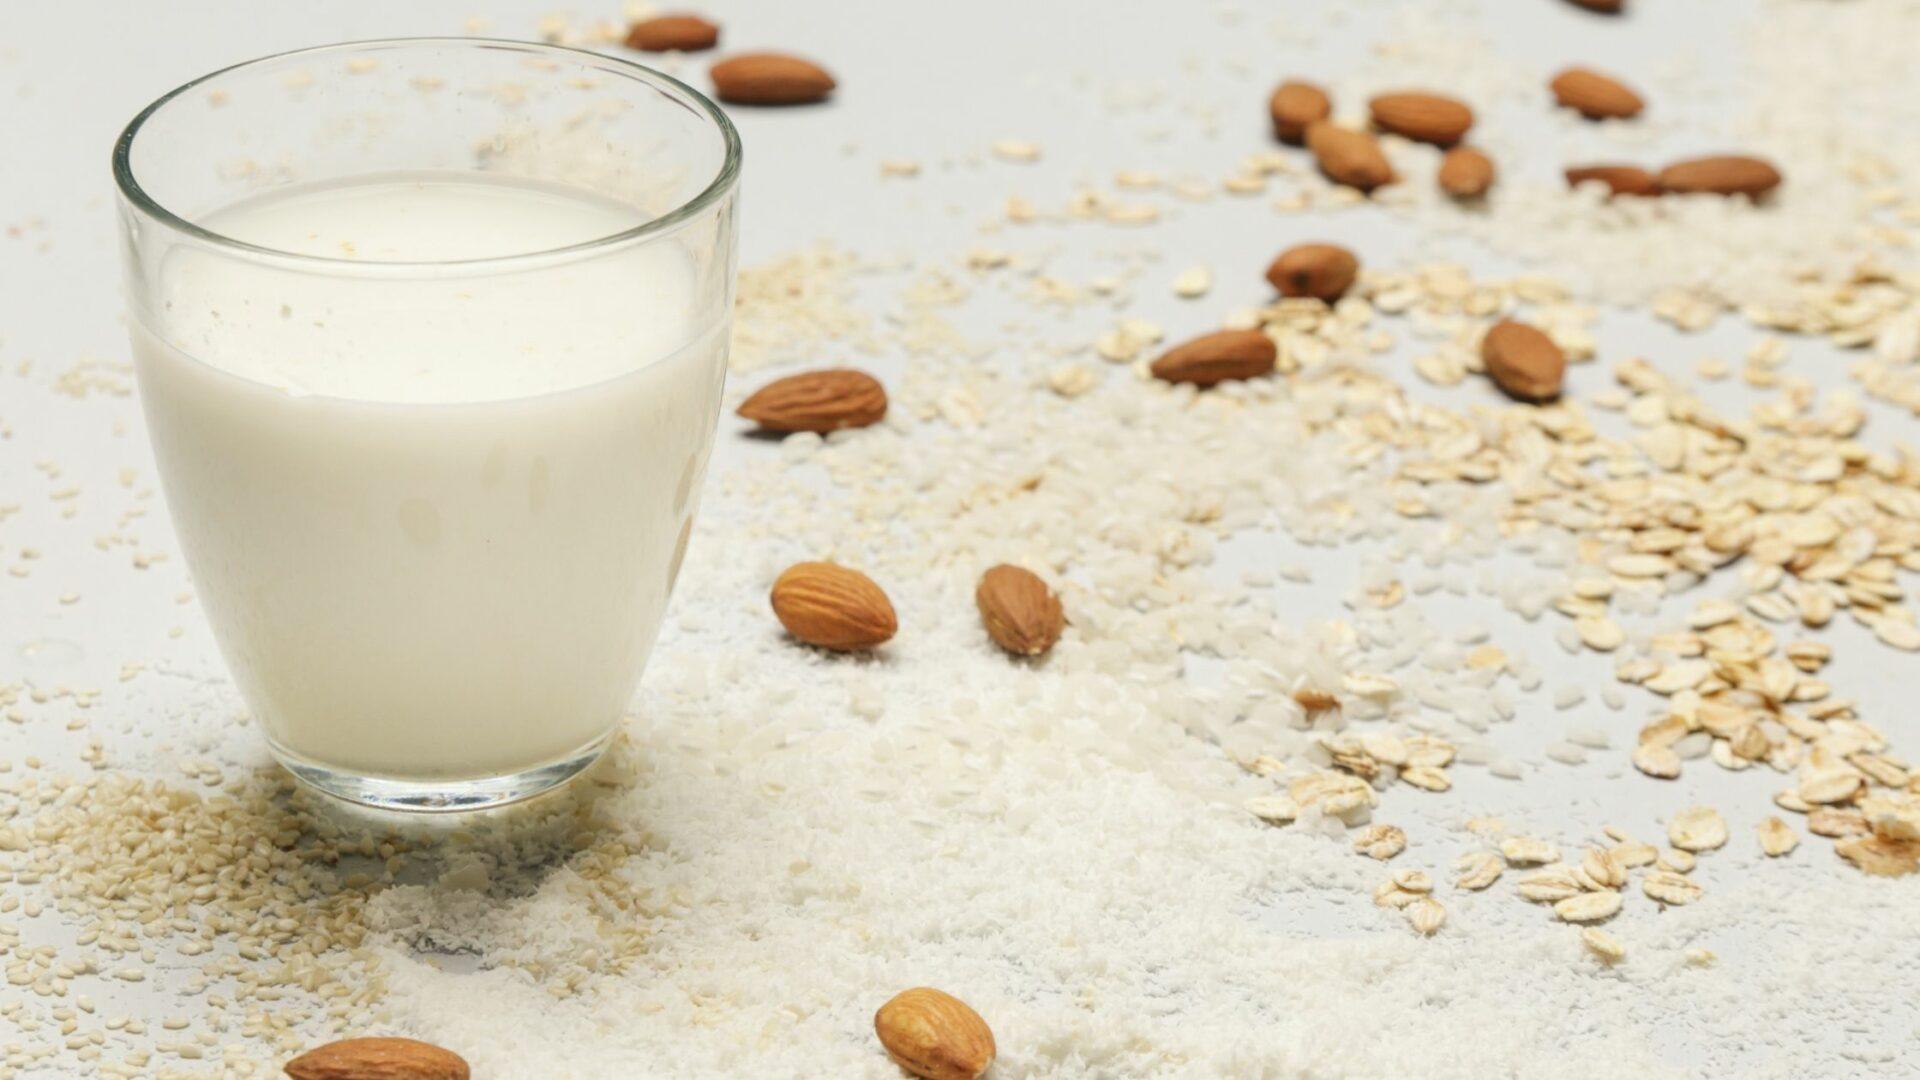 Lactose intolerance: are Plant-based Milk rich in Calcium?